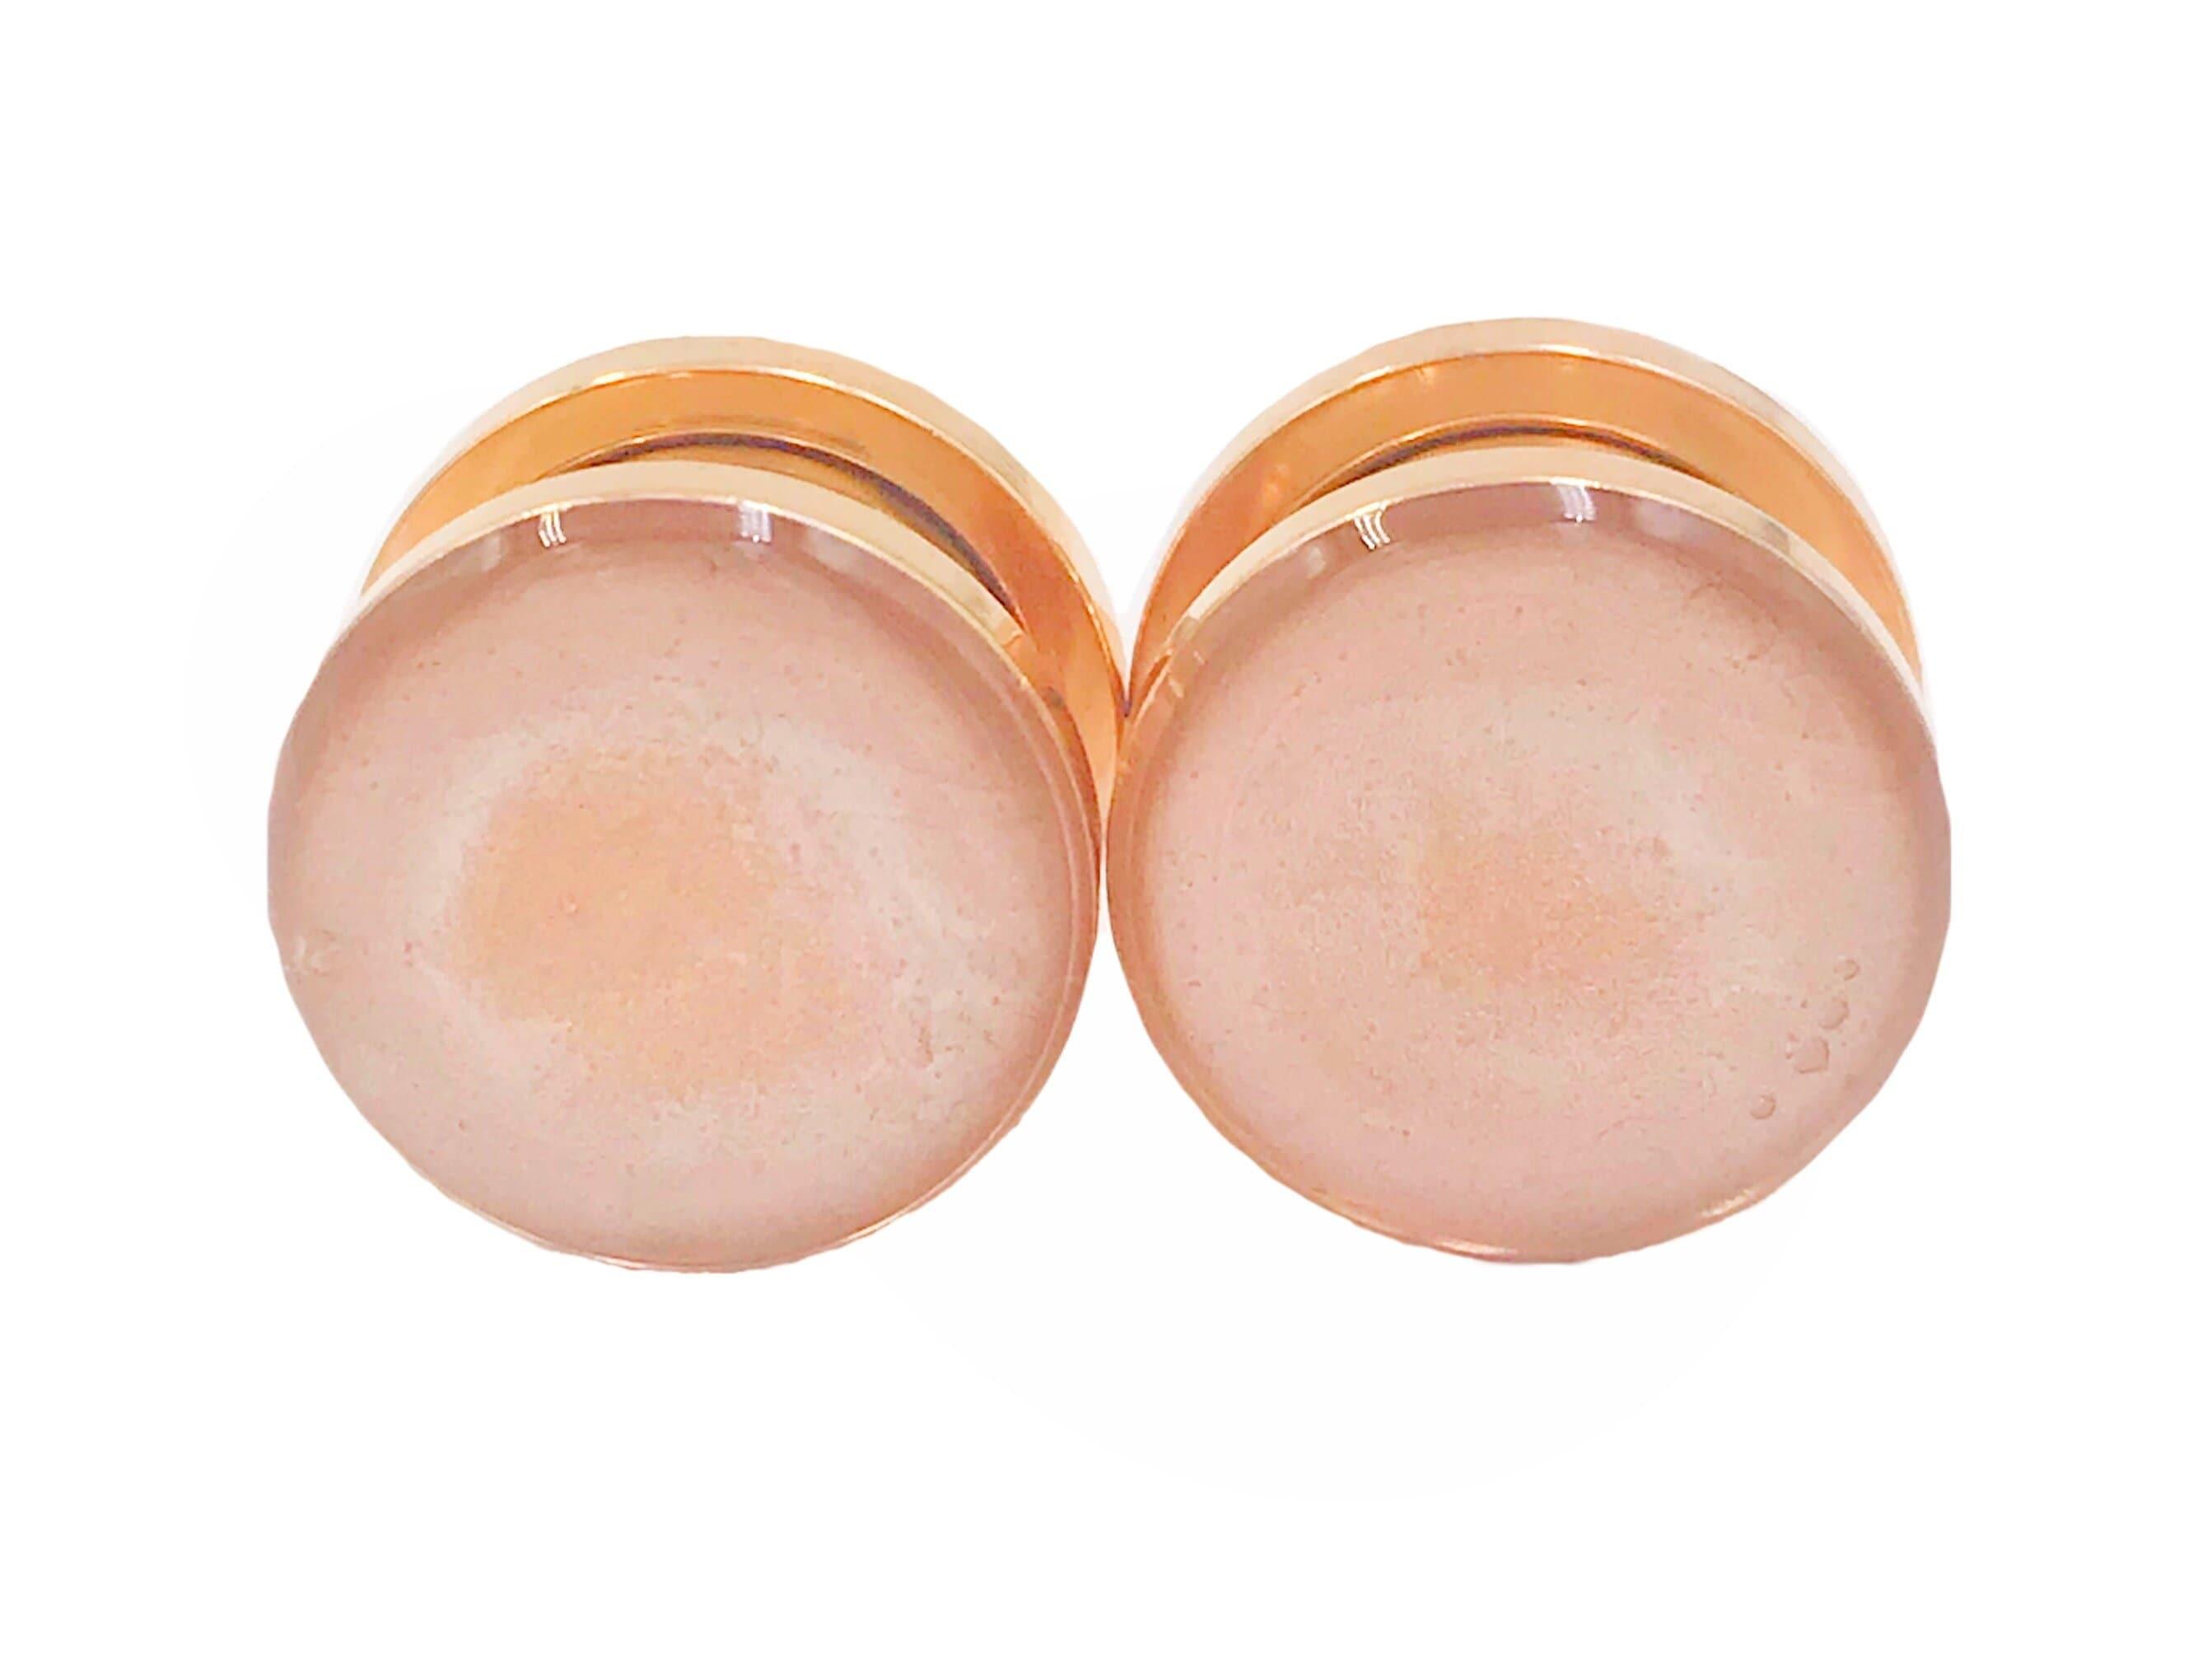 3//4in 4g 1 inch 1//2in 10g 7//16 9//16in 7//8in 2g 5//8in 6g 00g 8g Handmade Frosted Pink Sparkle Plugs 16g 0g